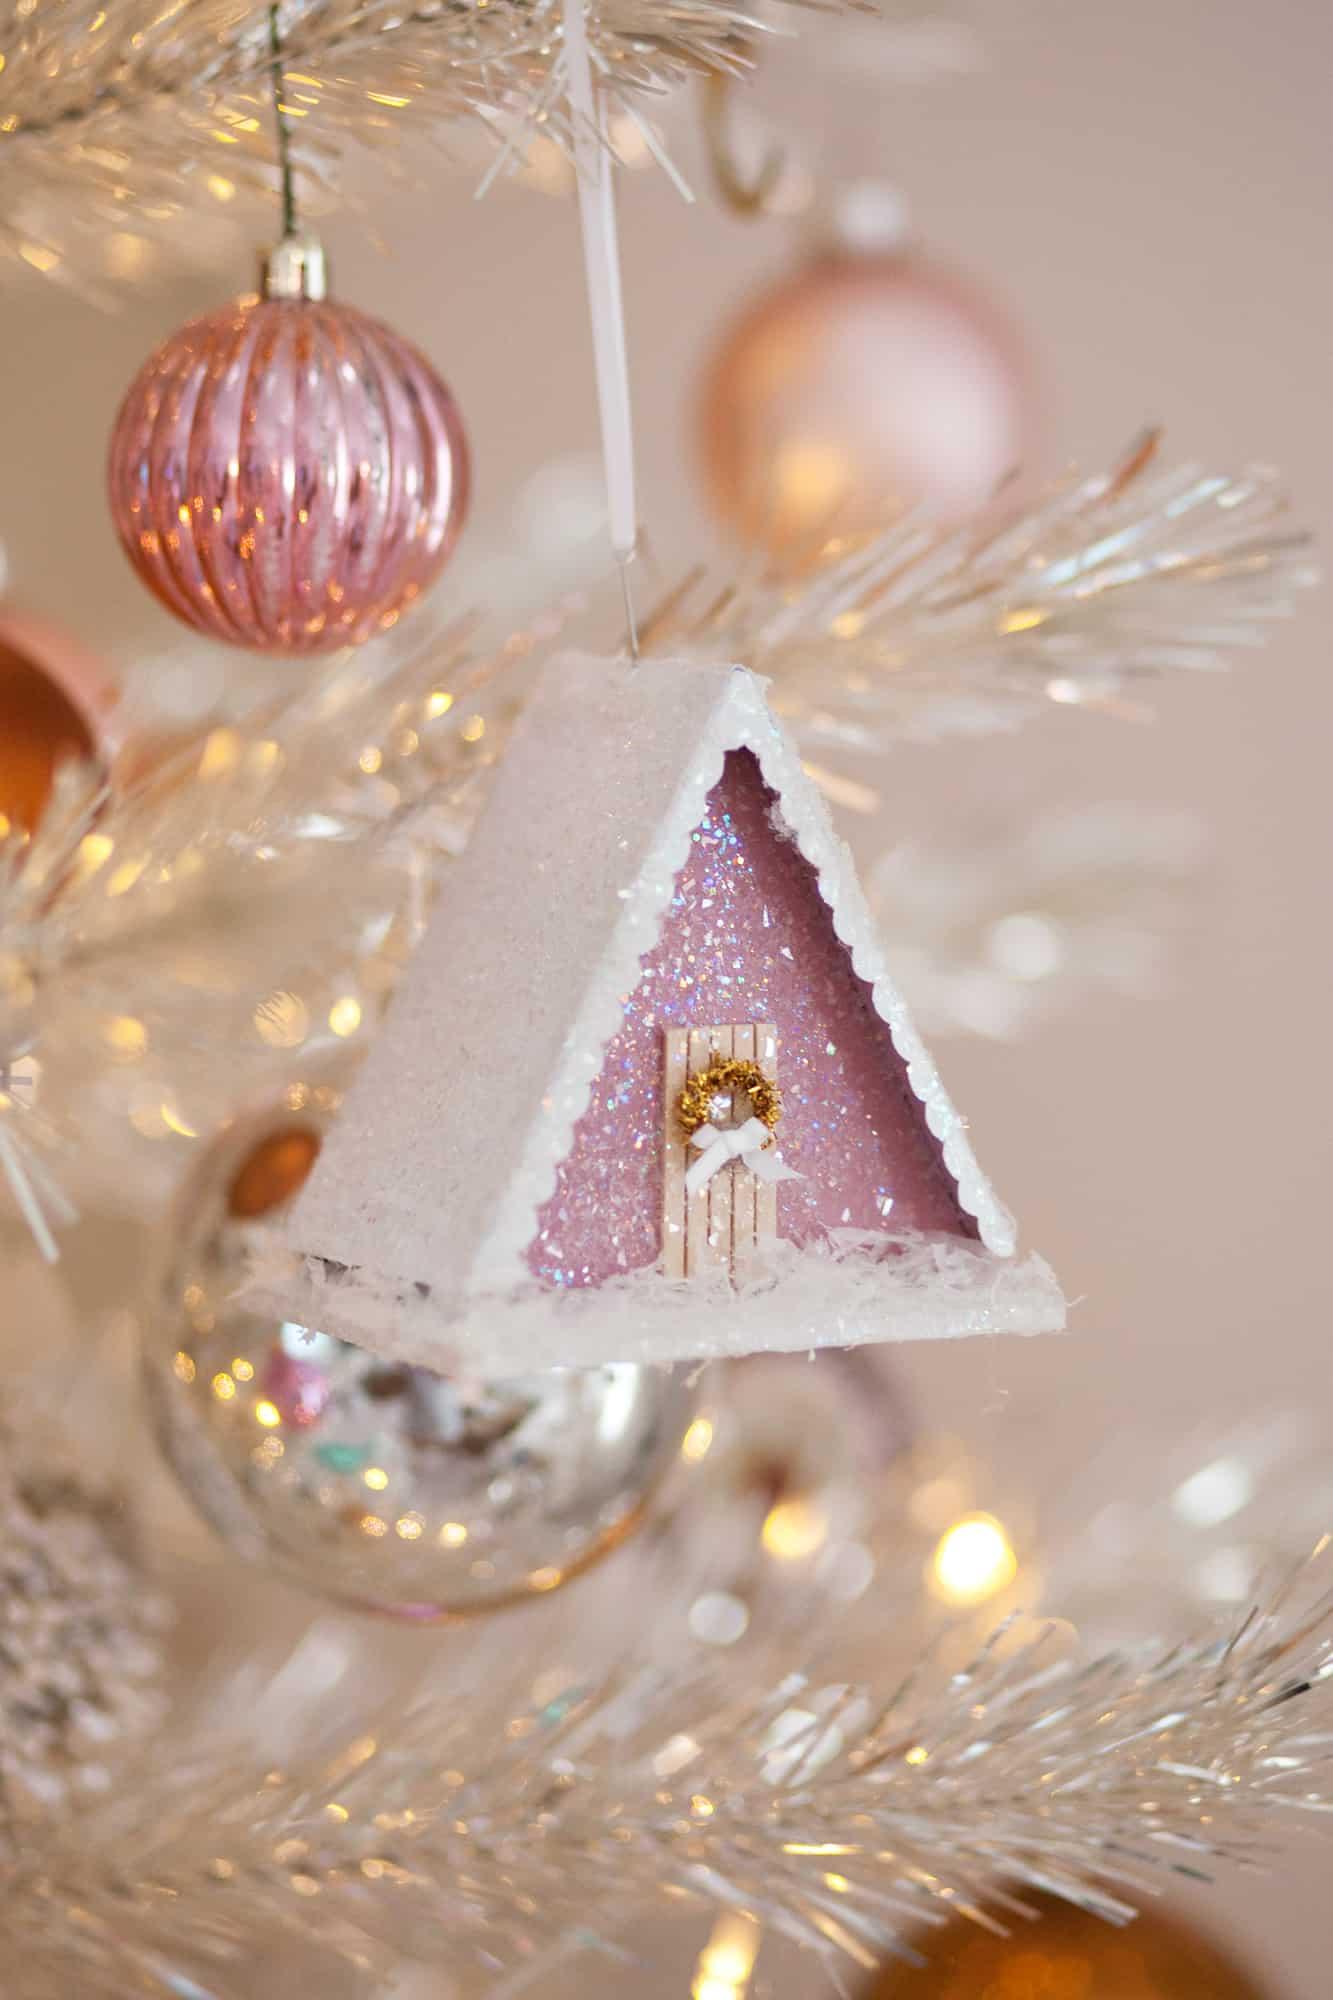 make a vintage-style putz house ornament